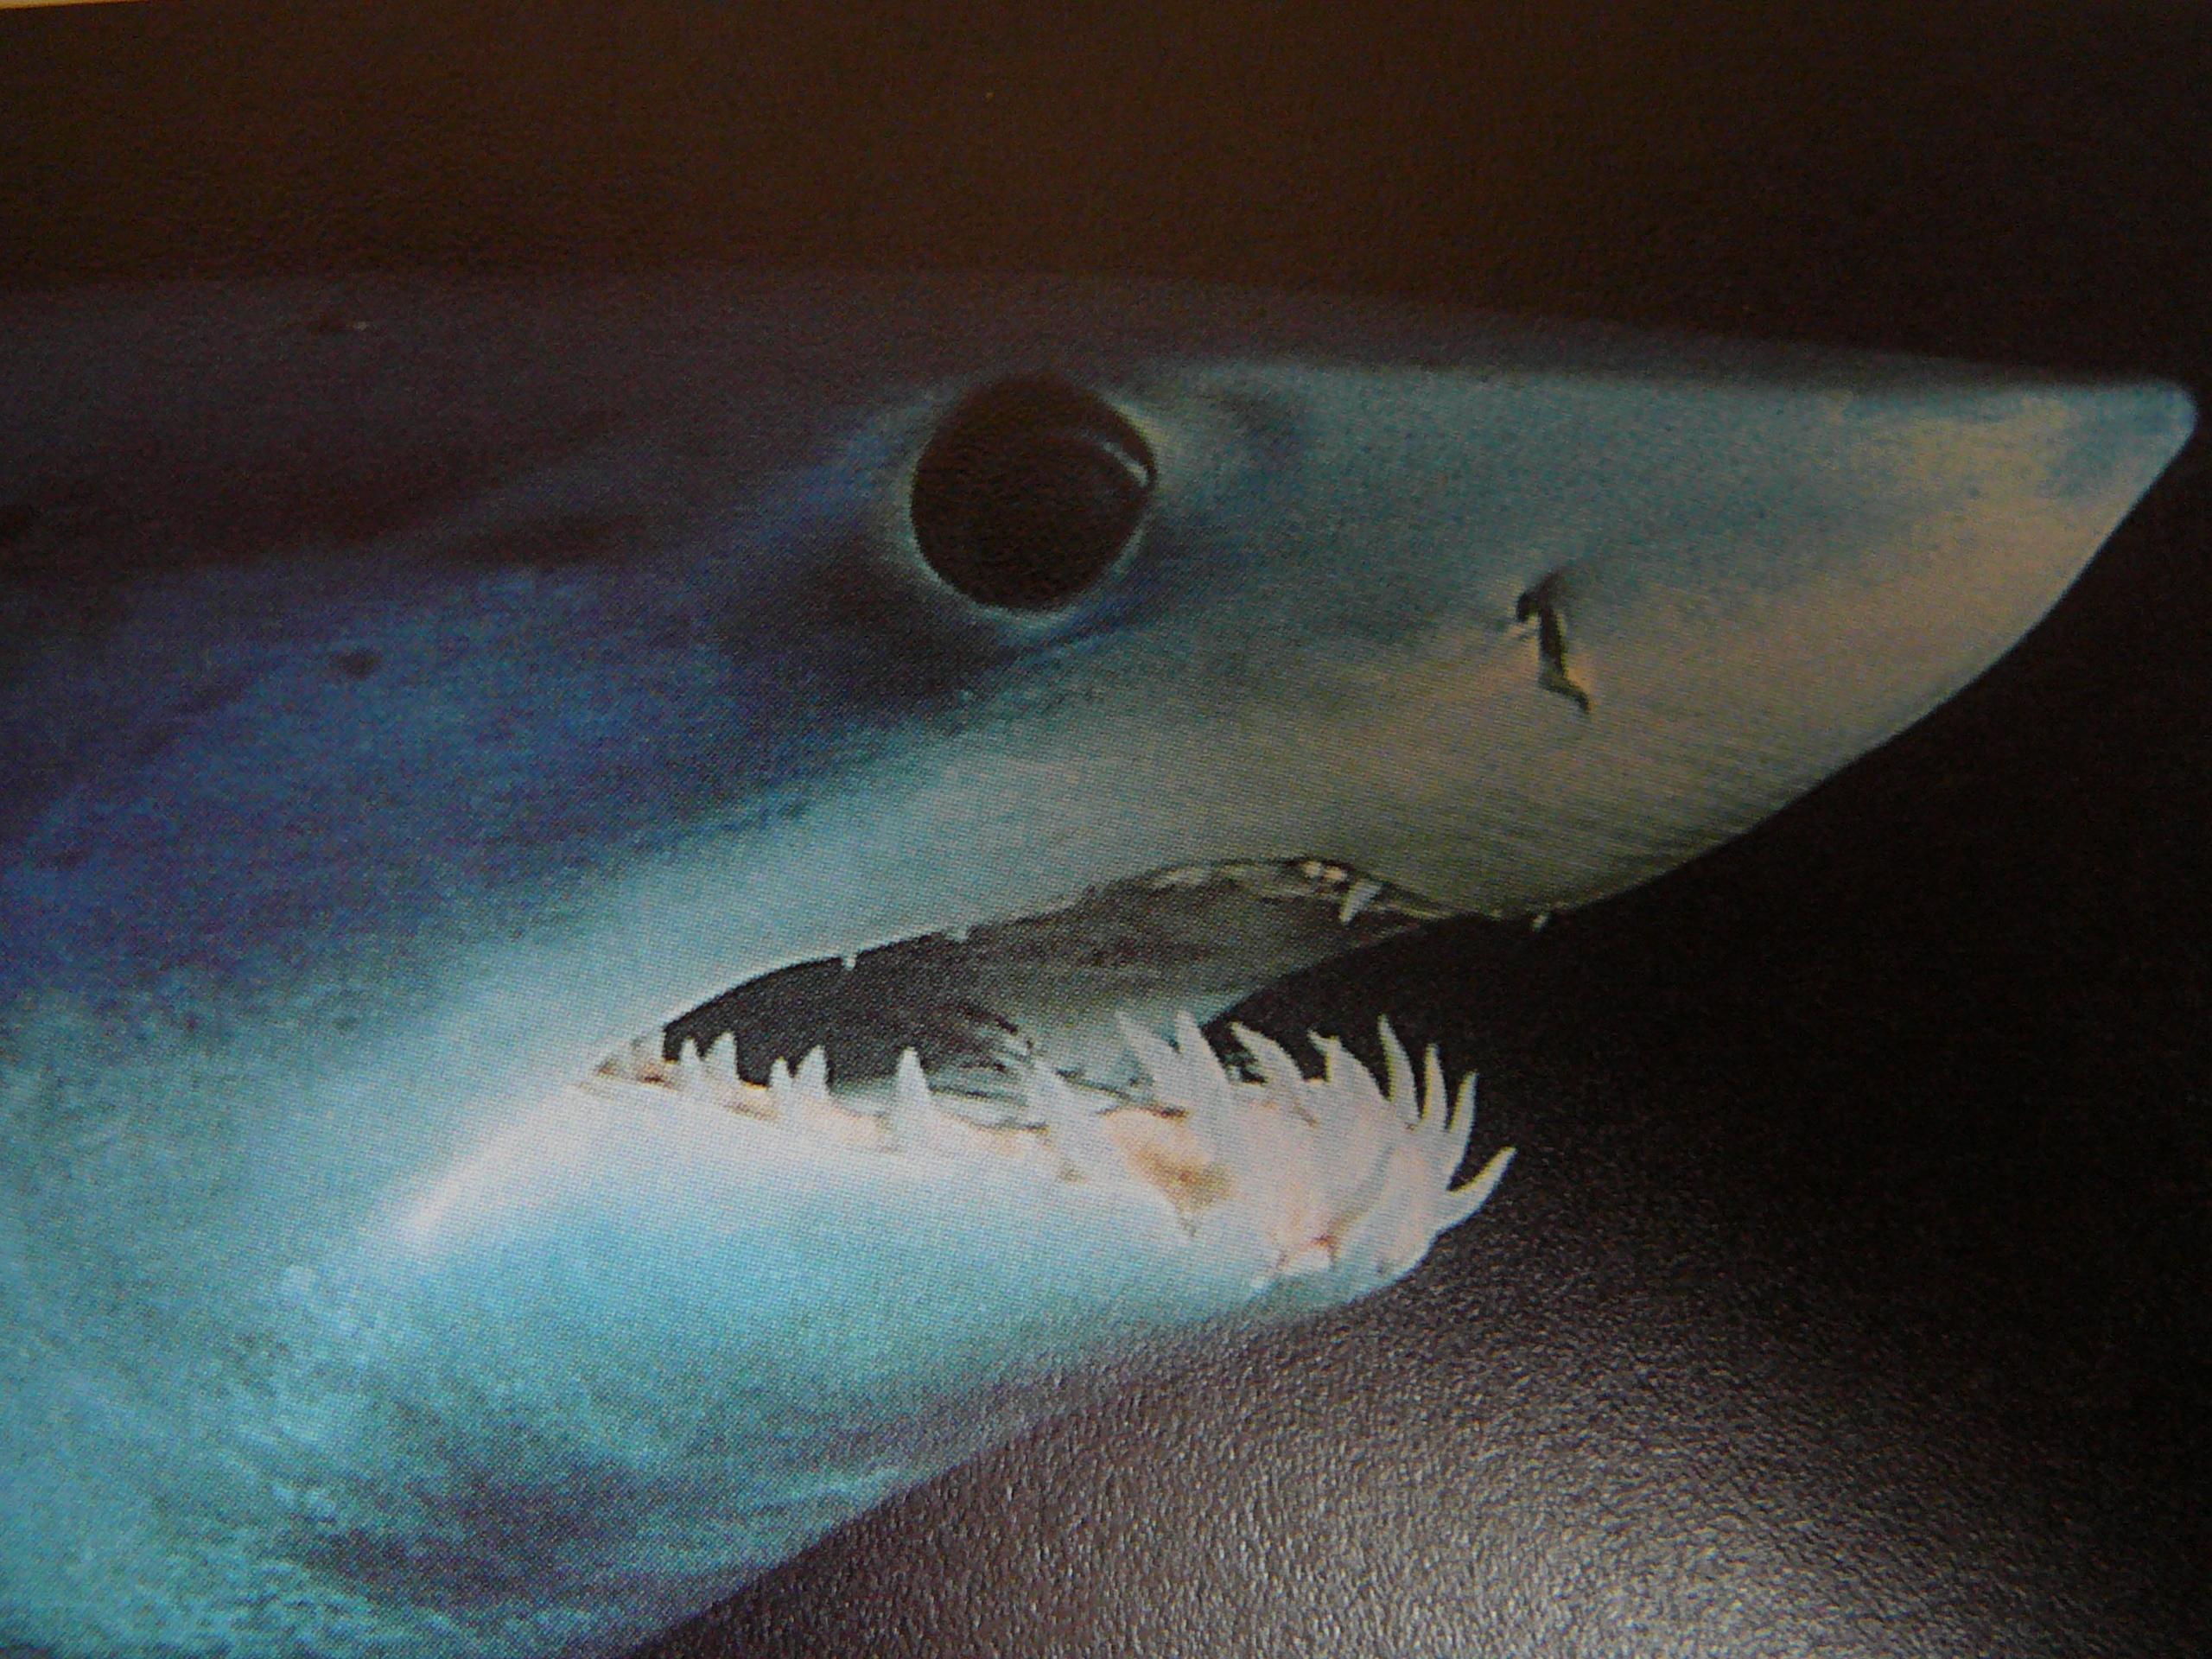 File:Close up of mako shark head 005.jpg